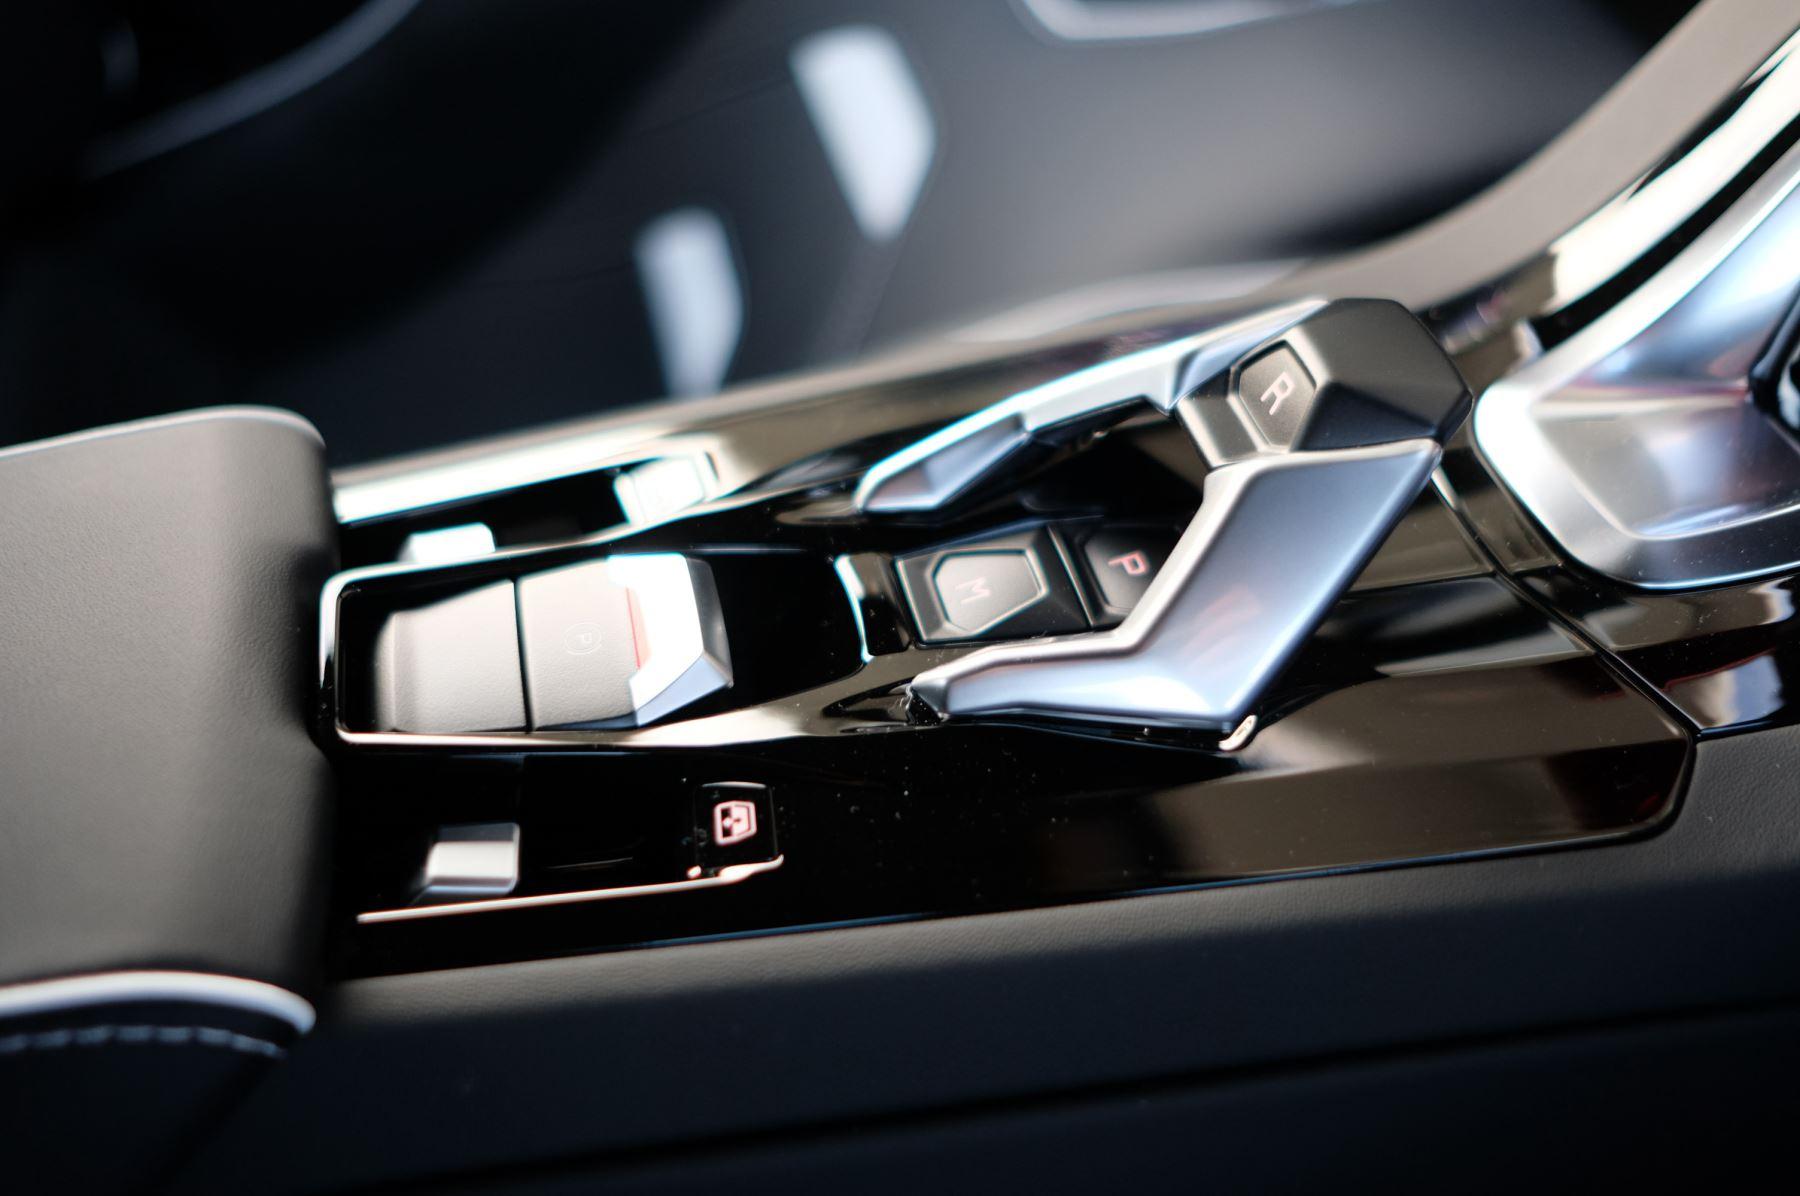 Lamborghini Huracan EVO Spyder 5.2 V10 640 2dr Auto AWD image 21